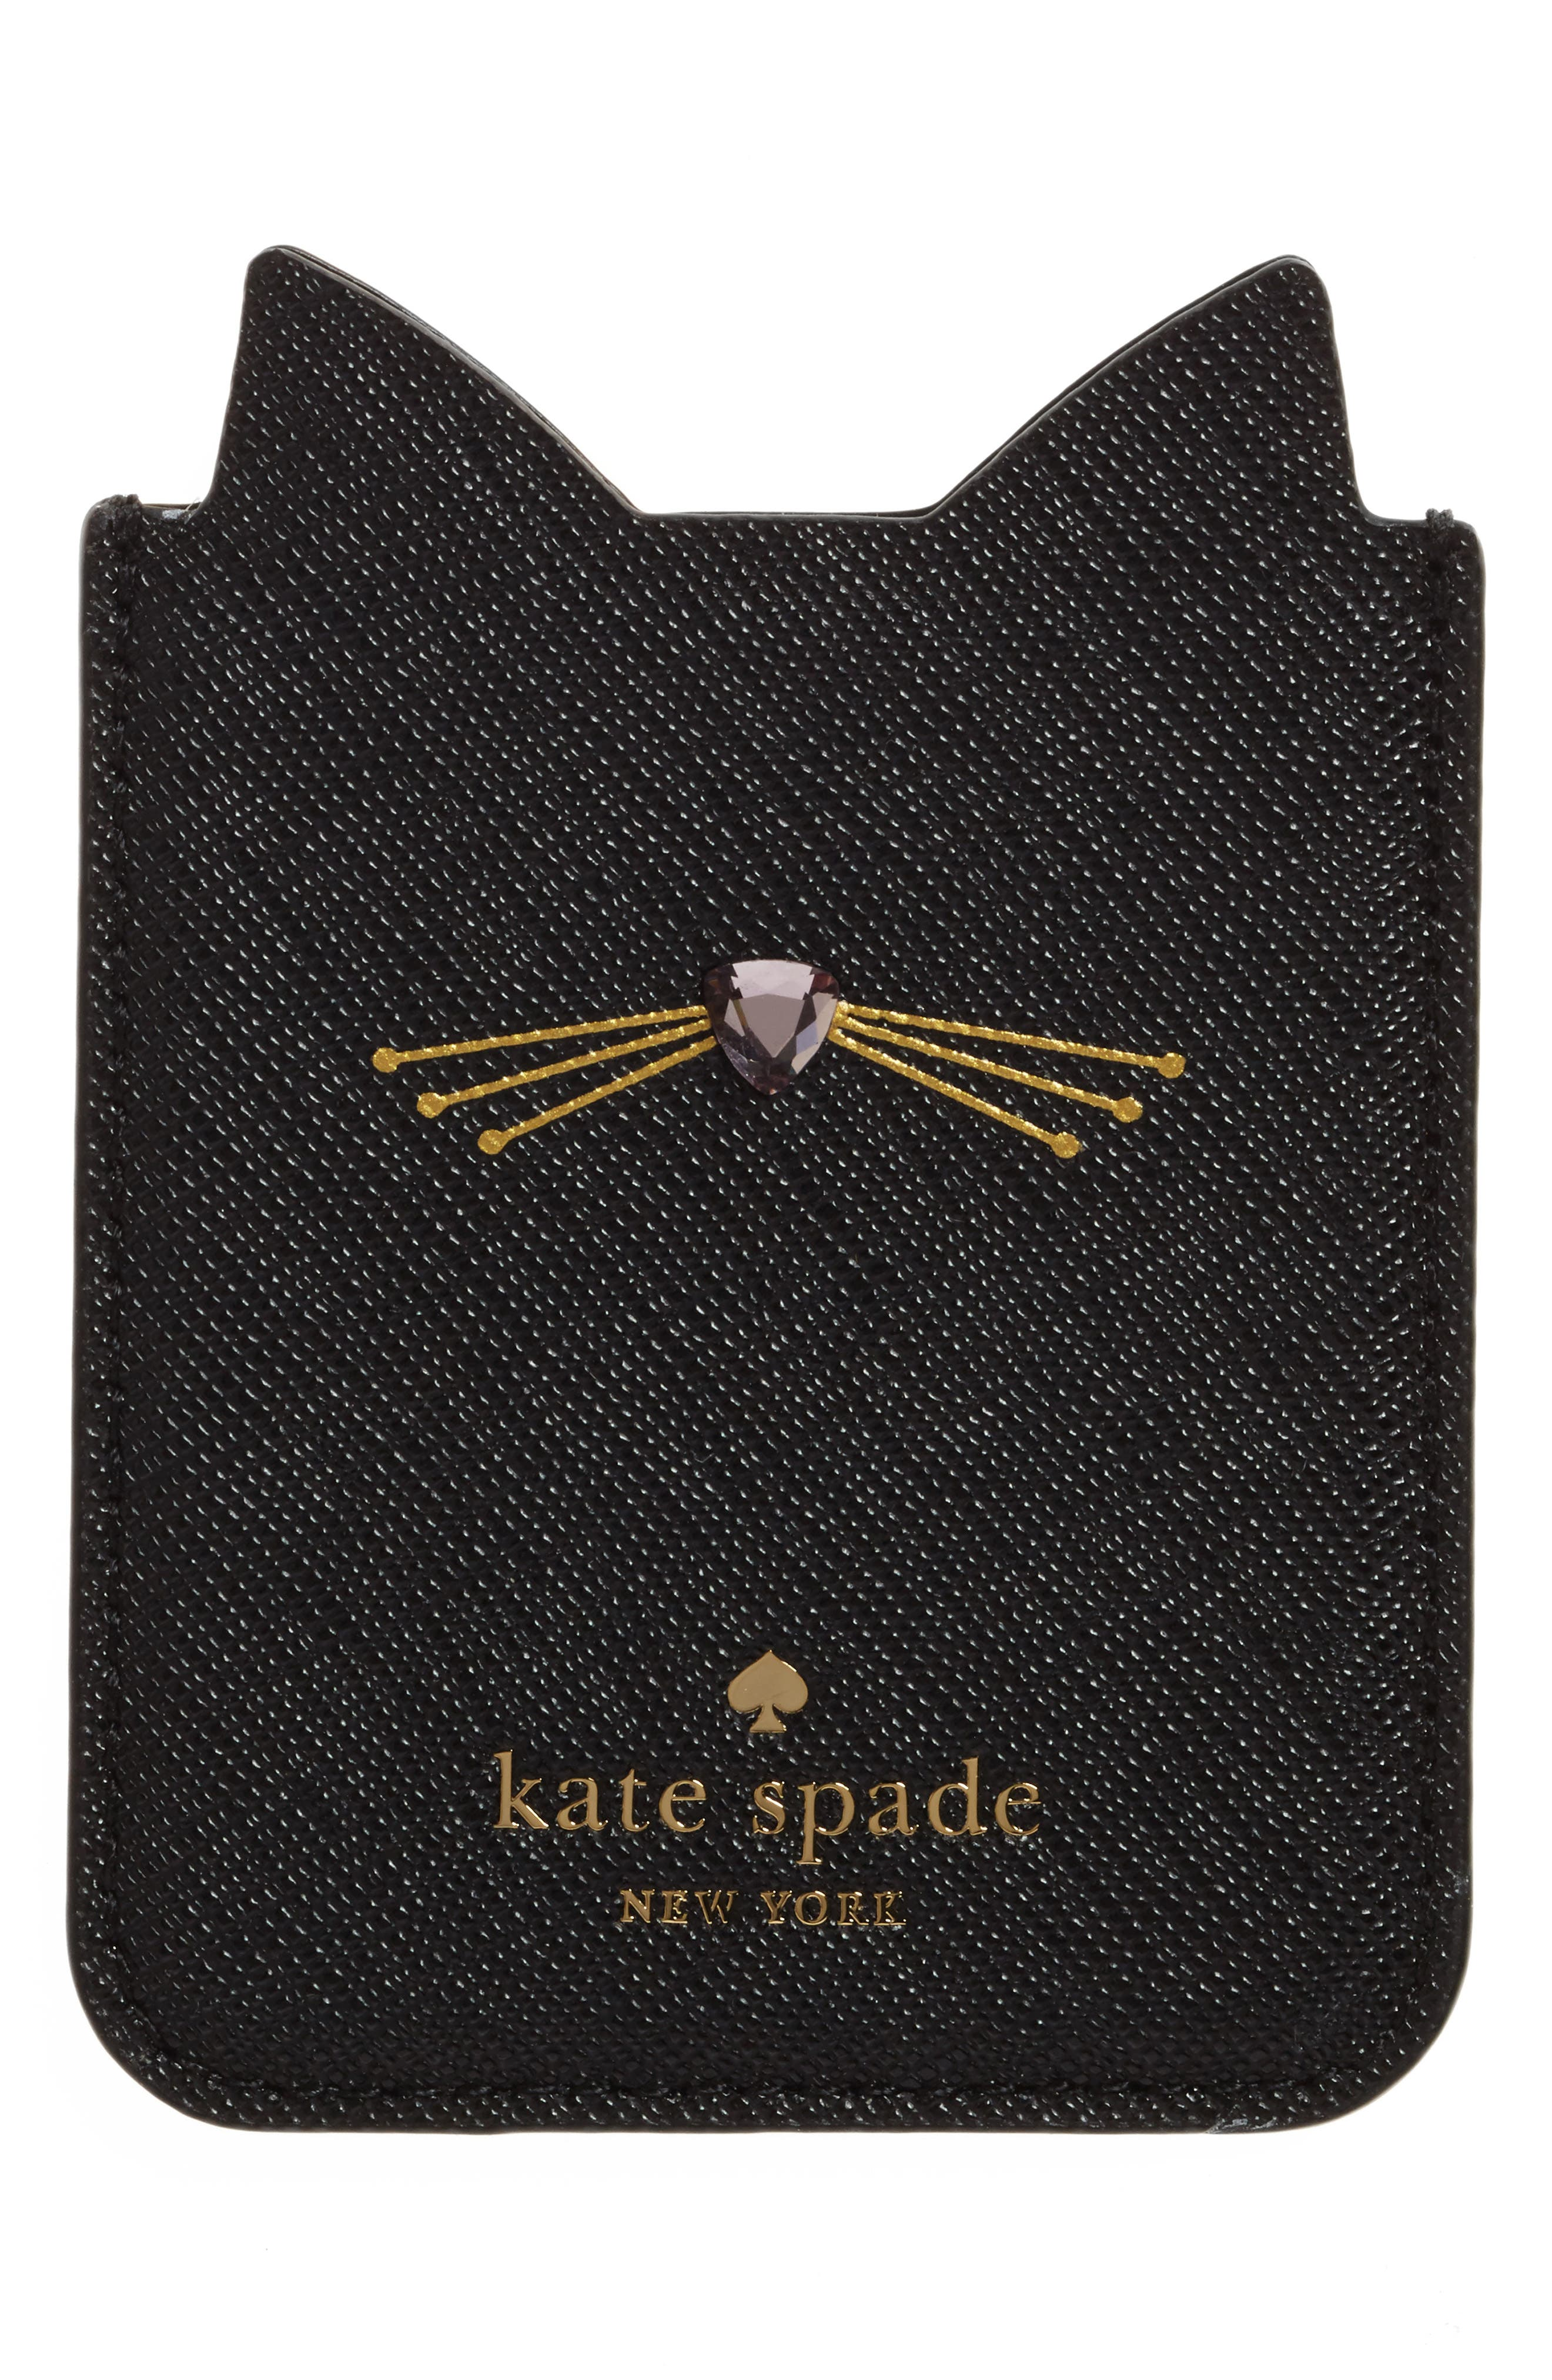 KATE SPADE NEW YORK, cat iPhone 7/8 sticker pocket, Alternate thumbnail 2, color, 001